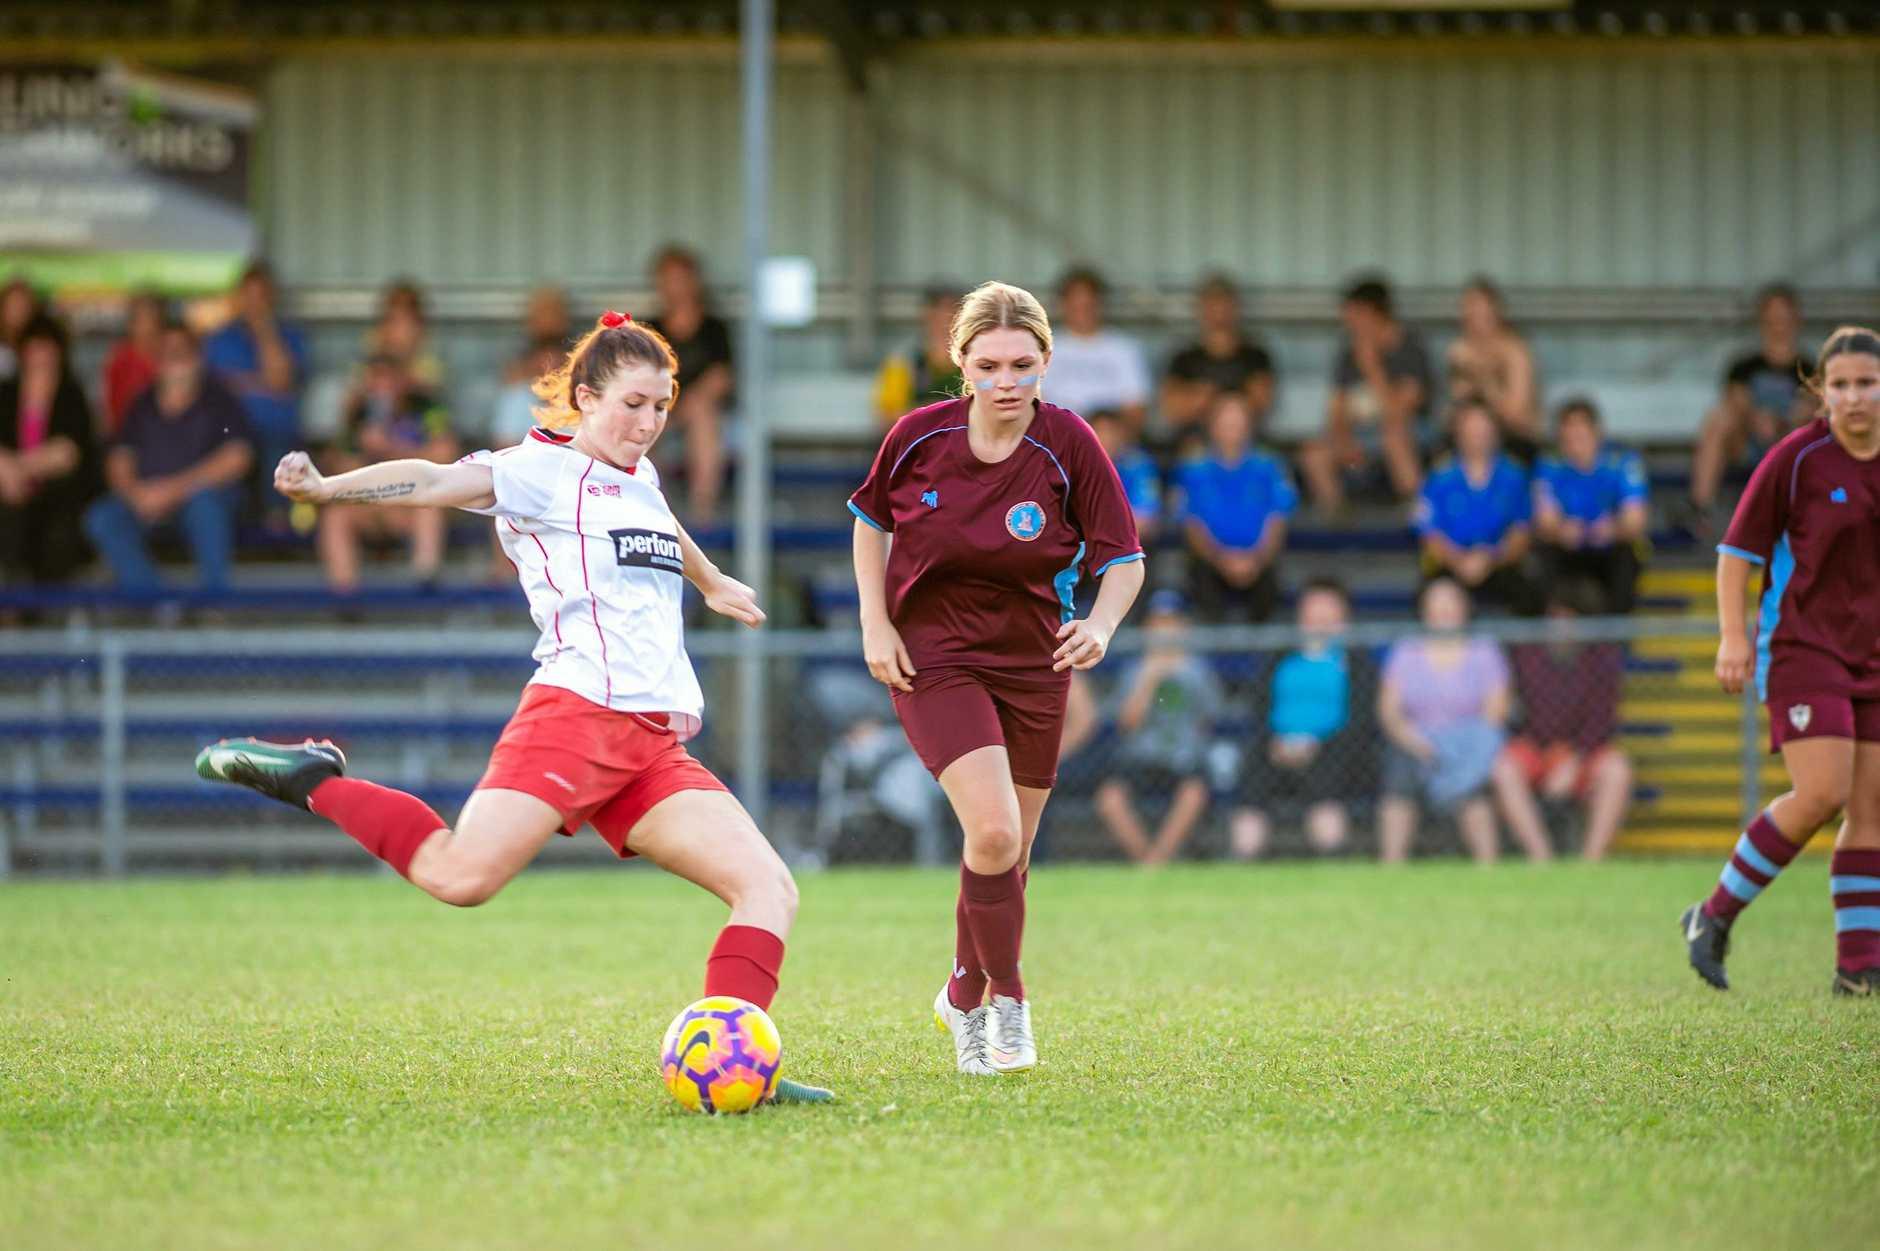 WINNER WINNER: Gympie Lions player Jaidyn Dennien took out the player of the final award in her futsal side's 10-6 futsal grand final win on Monday.